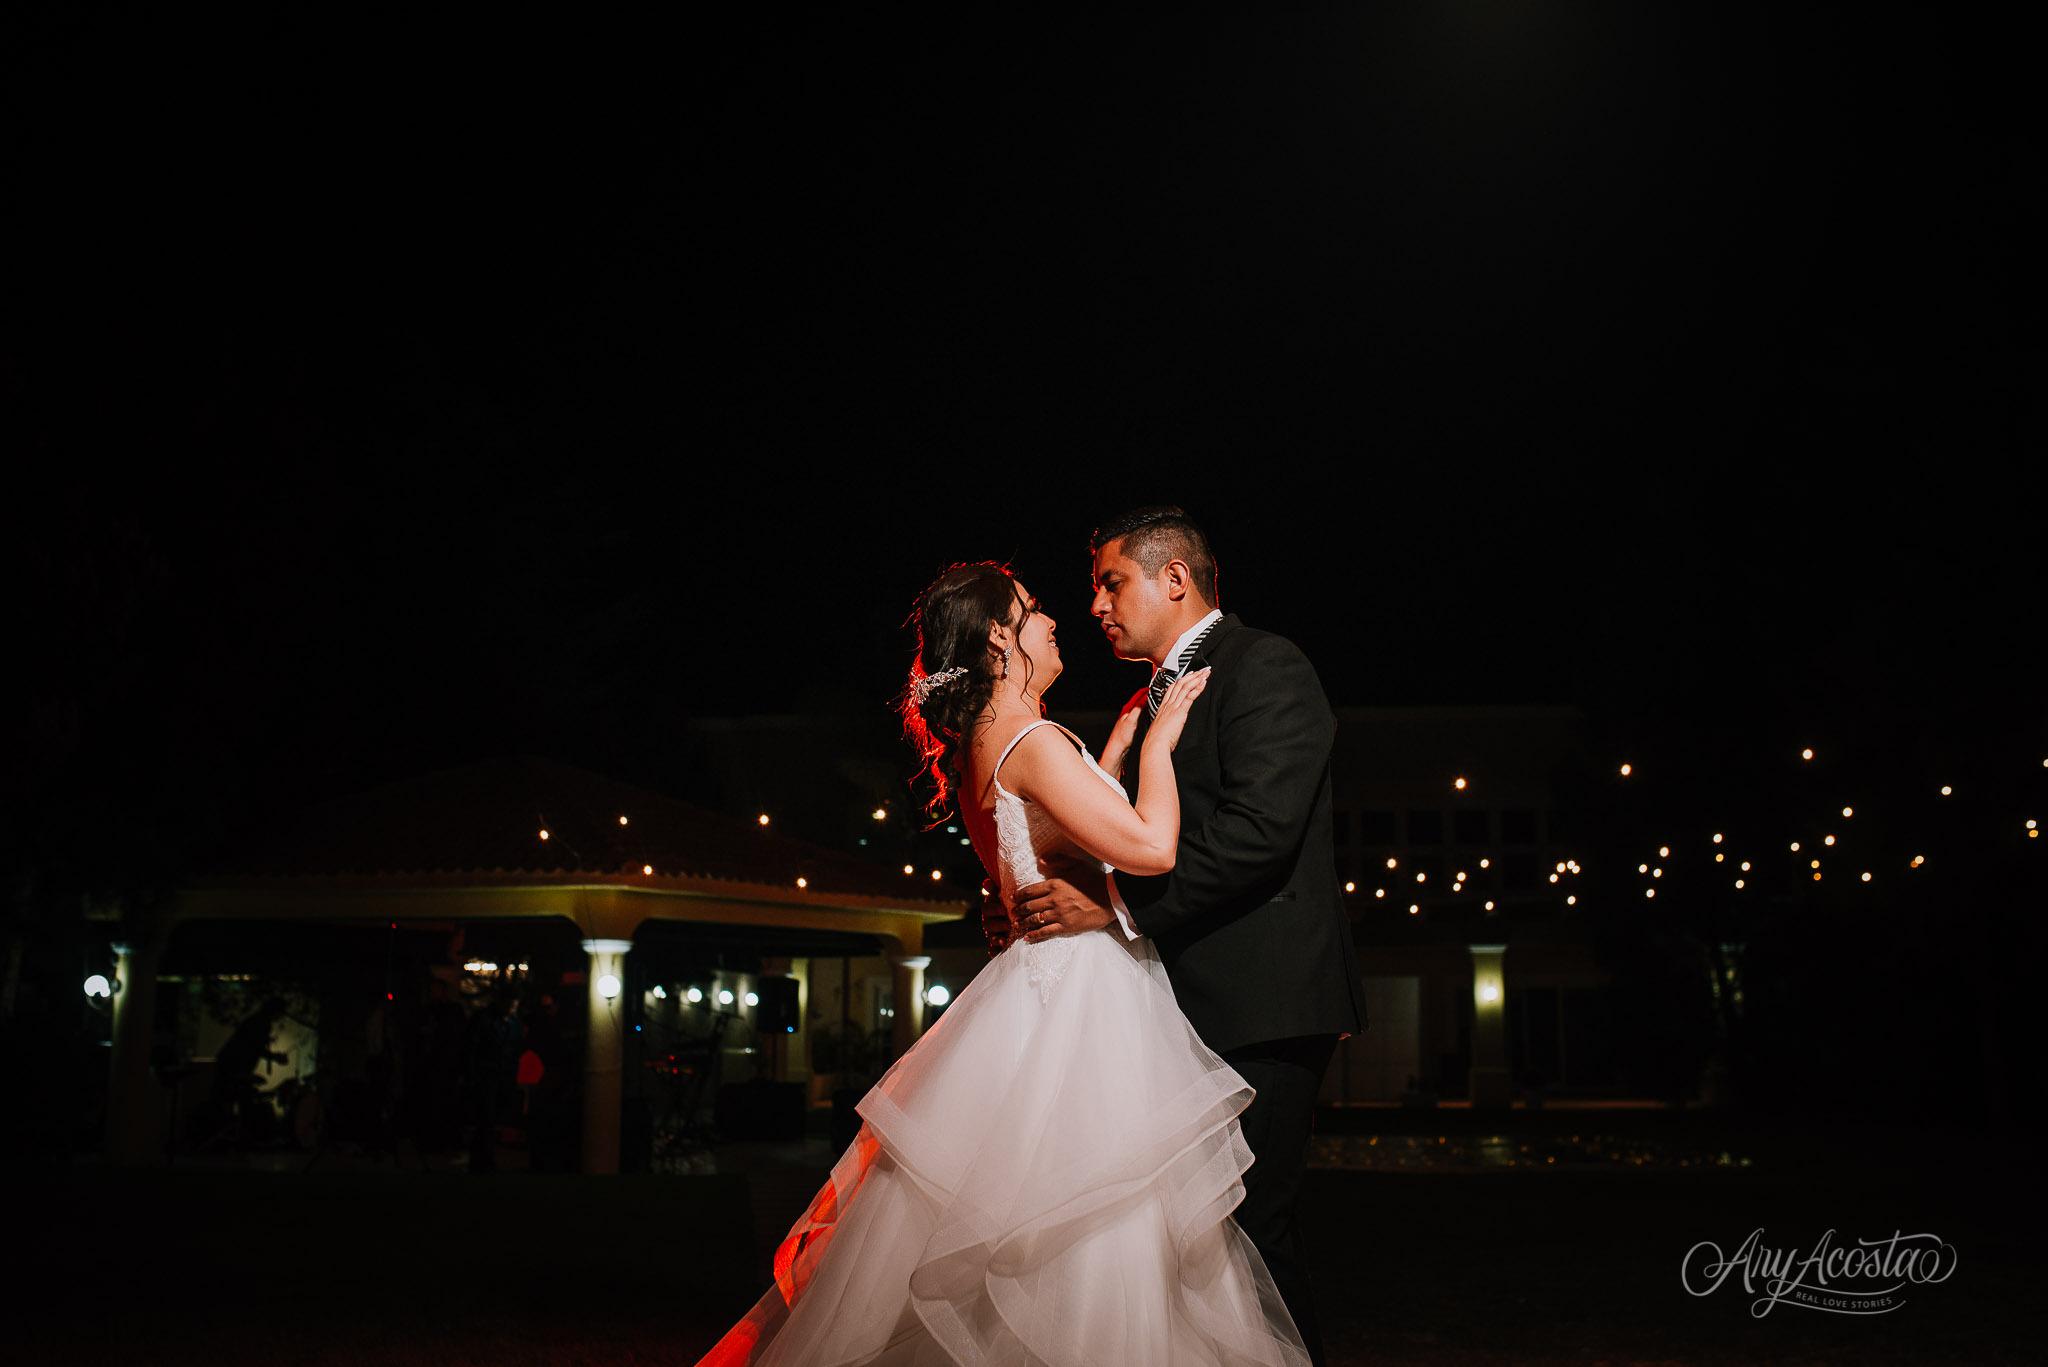 yazmin_ernesto_wedding-602.JPG